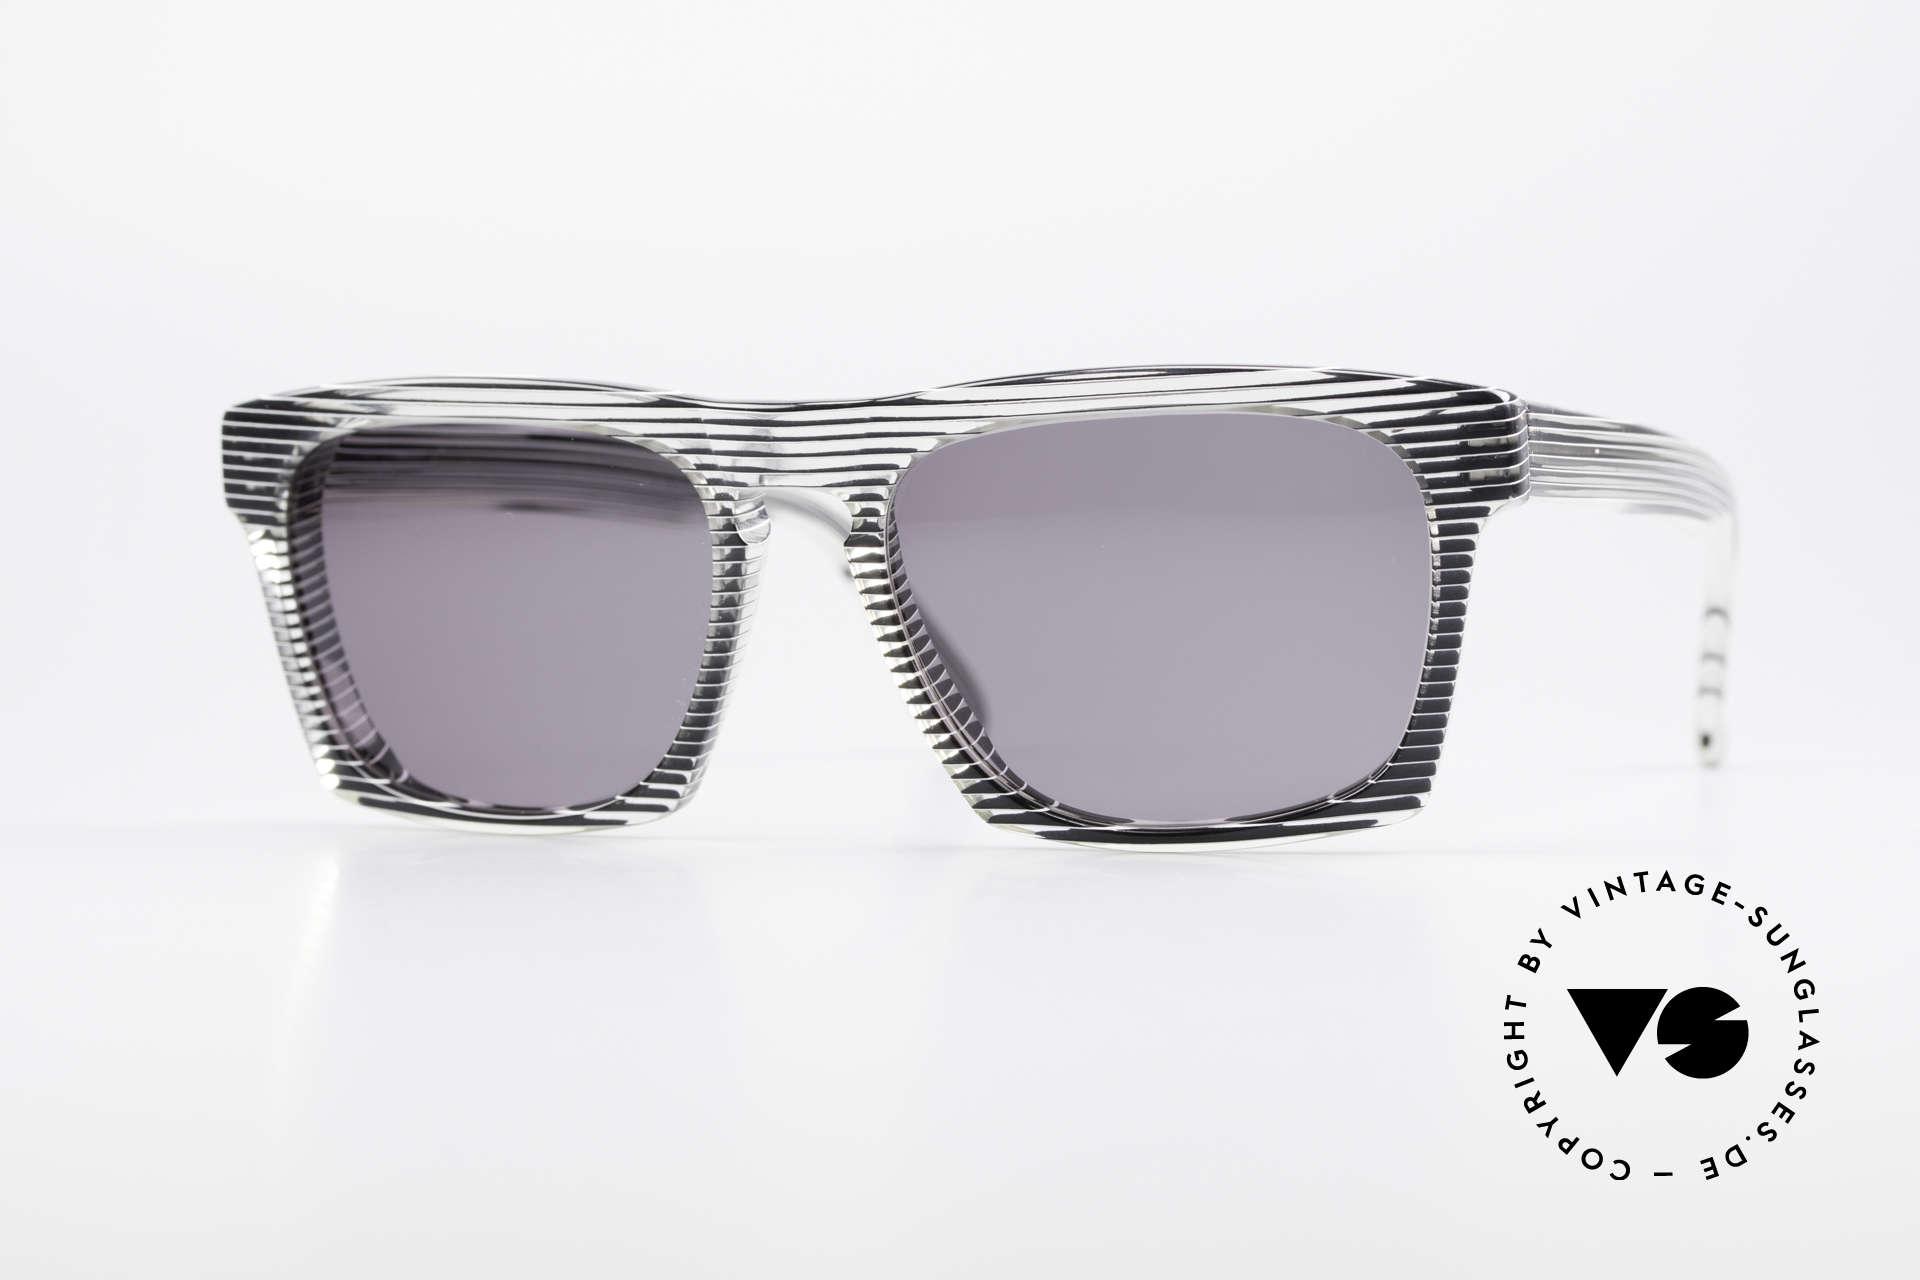 Alain Mikli 707 / 986 Unique Designer Sunglasses, vintage ALAIN MIKLI designer sunglasses from 1986, Made for Men and Women